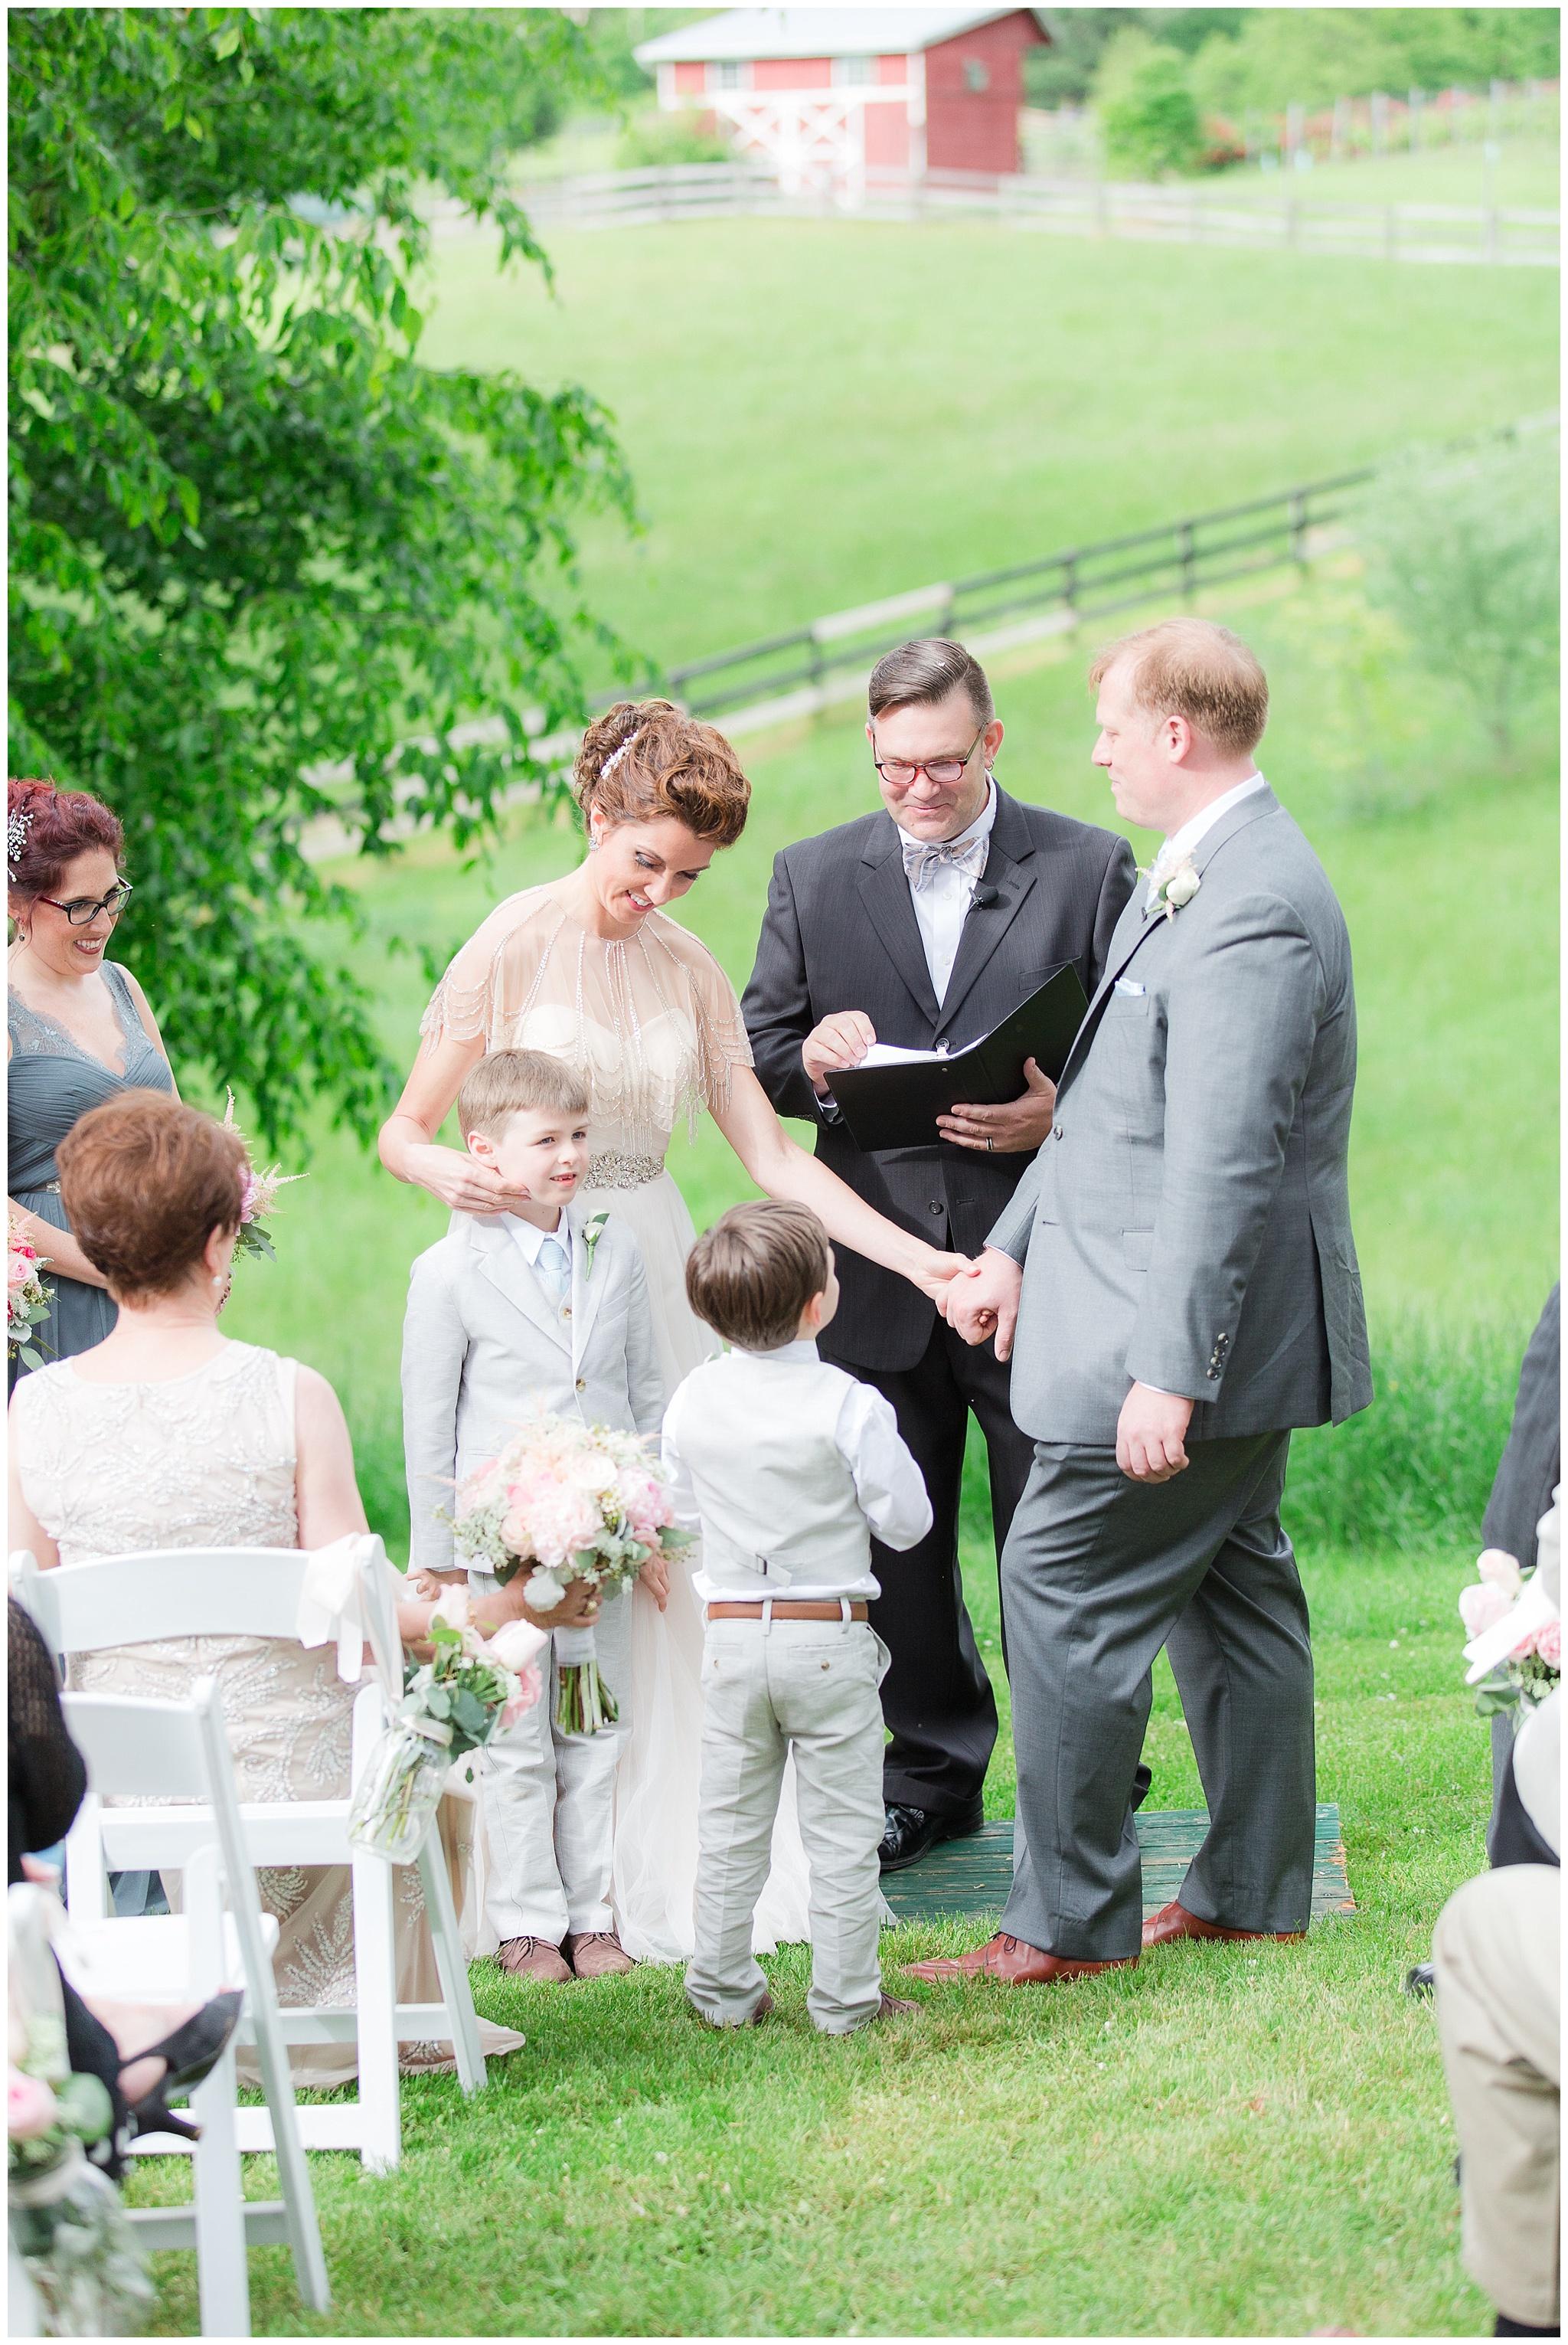 Wedding_Courtney_David_0054.jpg